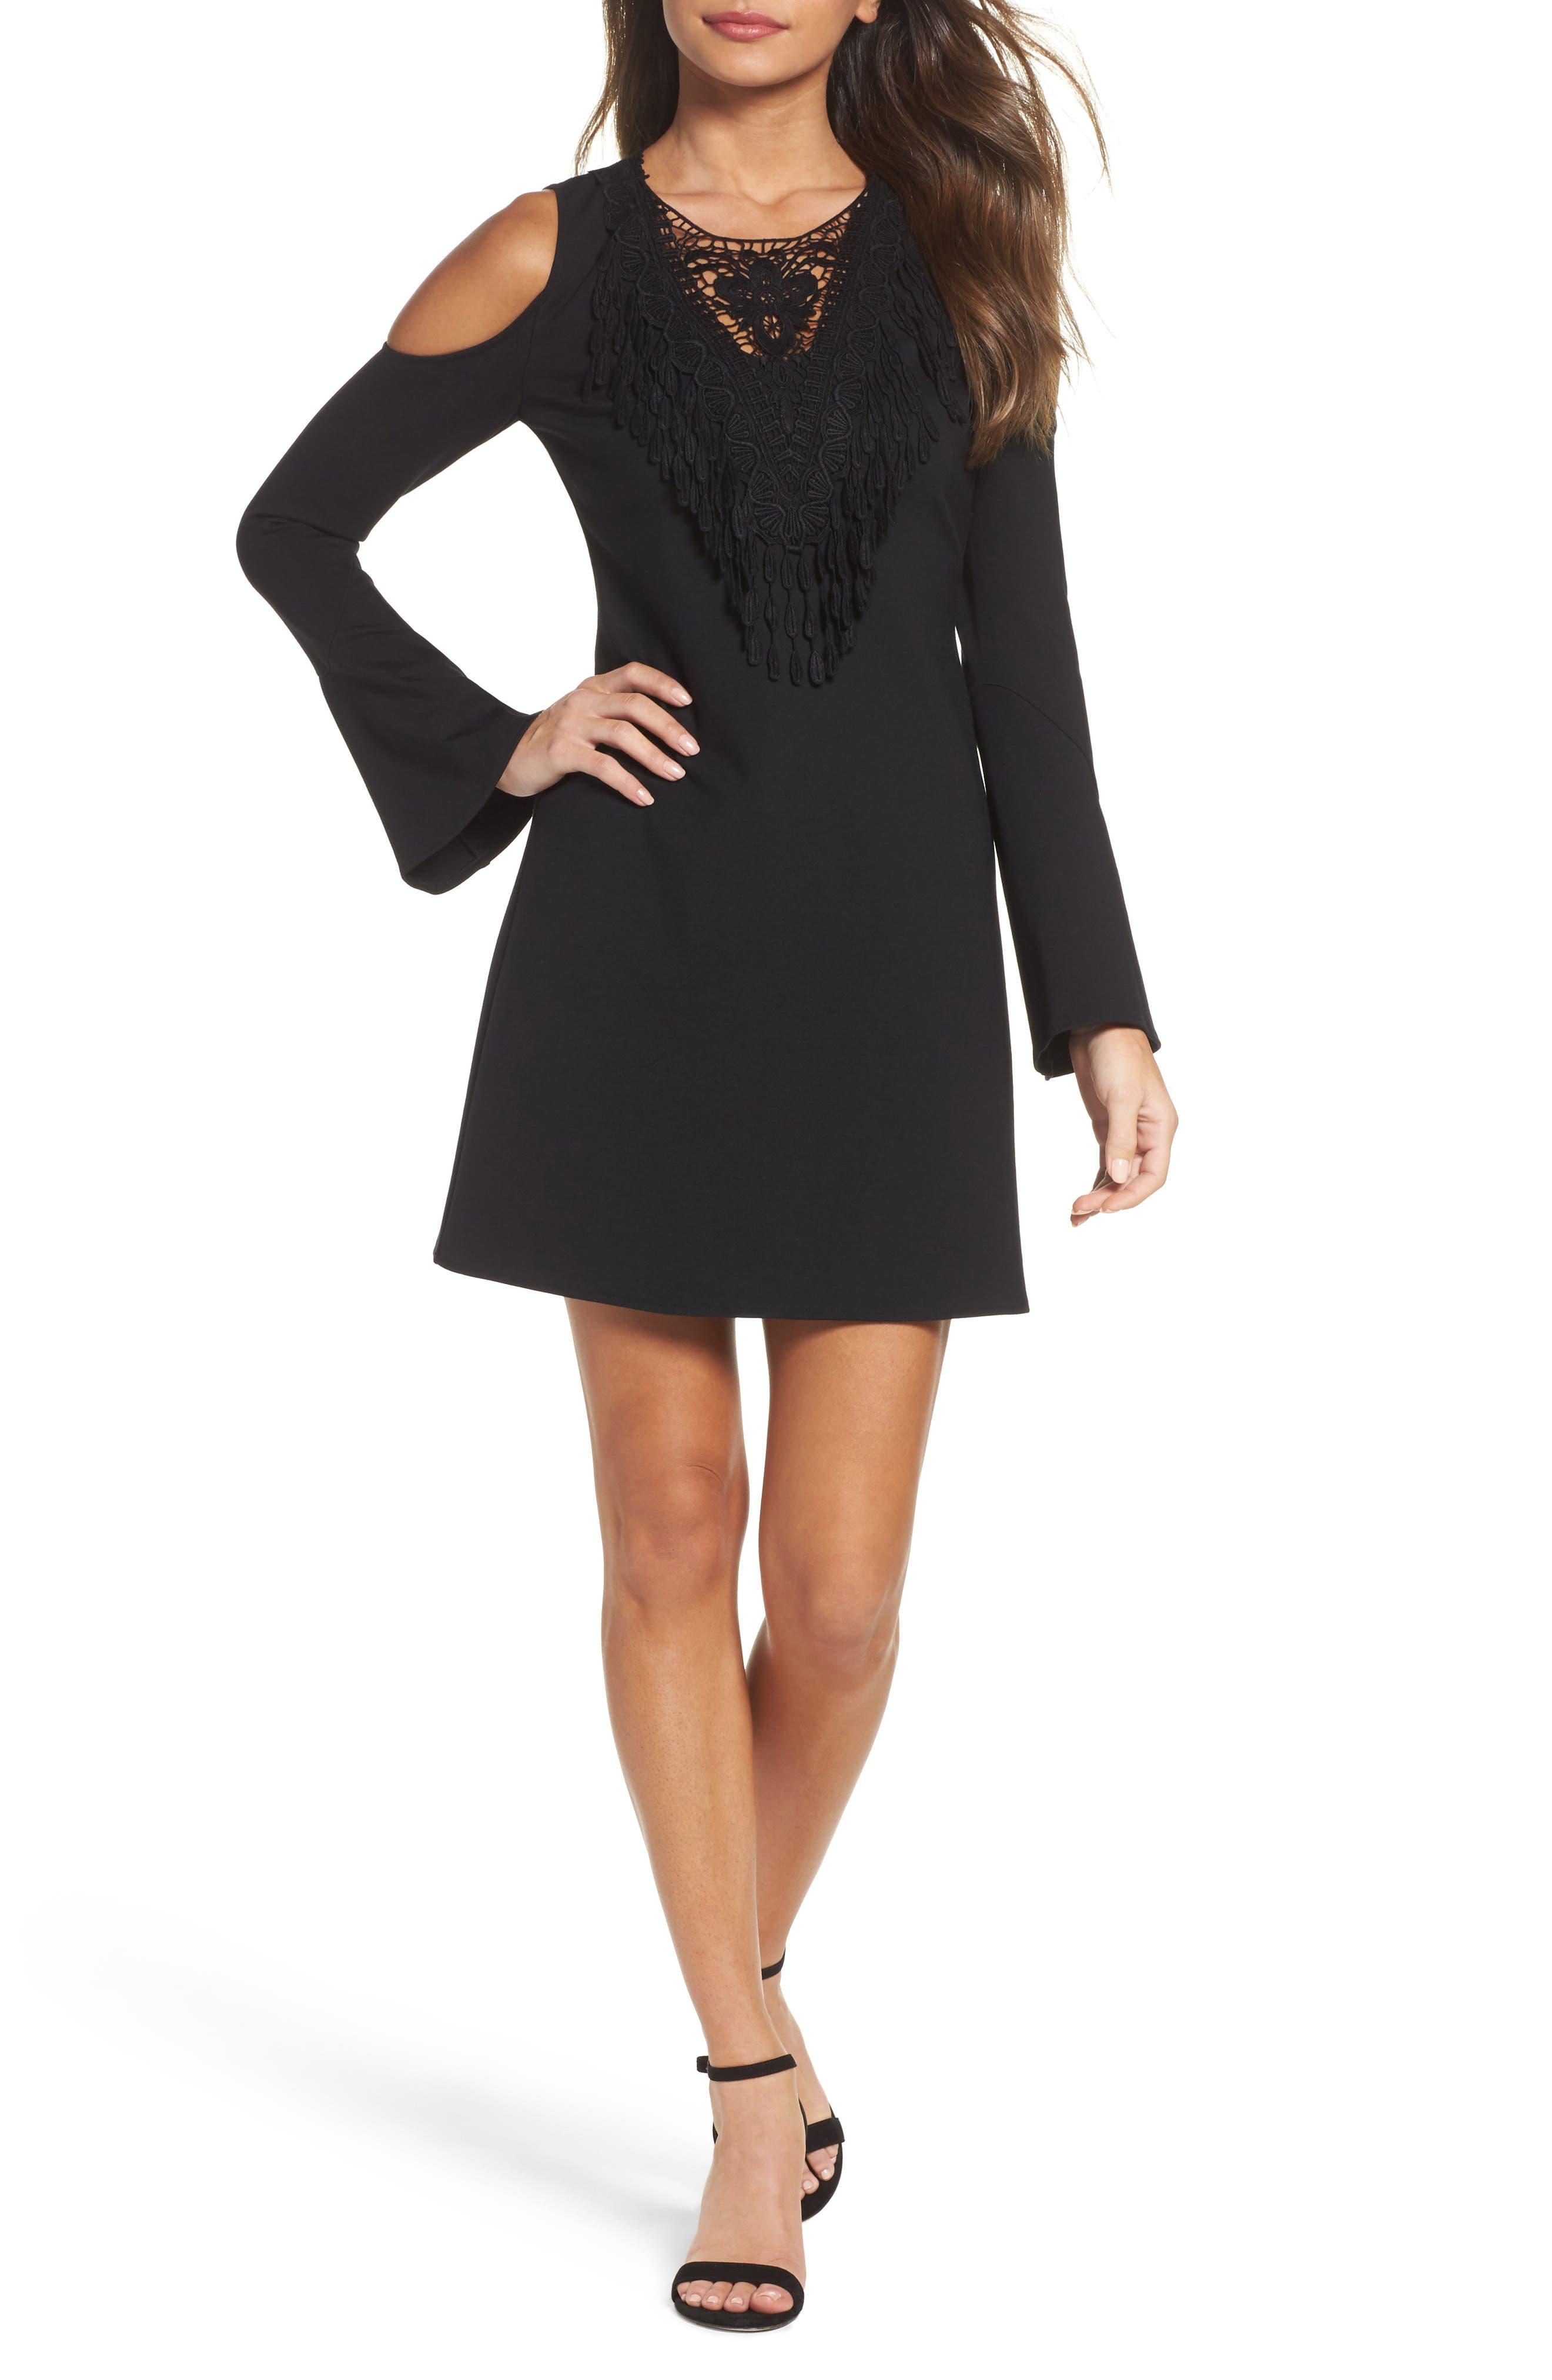 Alternate Image 1 Selected - Kobi Halperin Brie Double Knit Shift Dress (Nordstrom Exclusive)